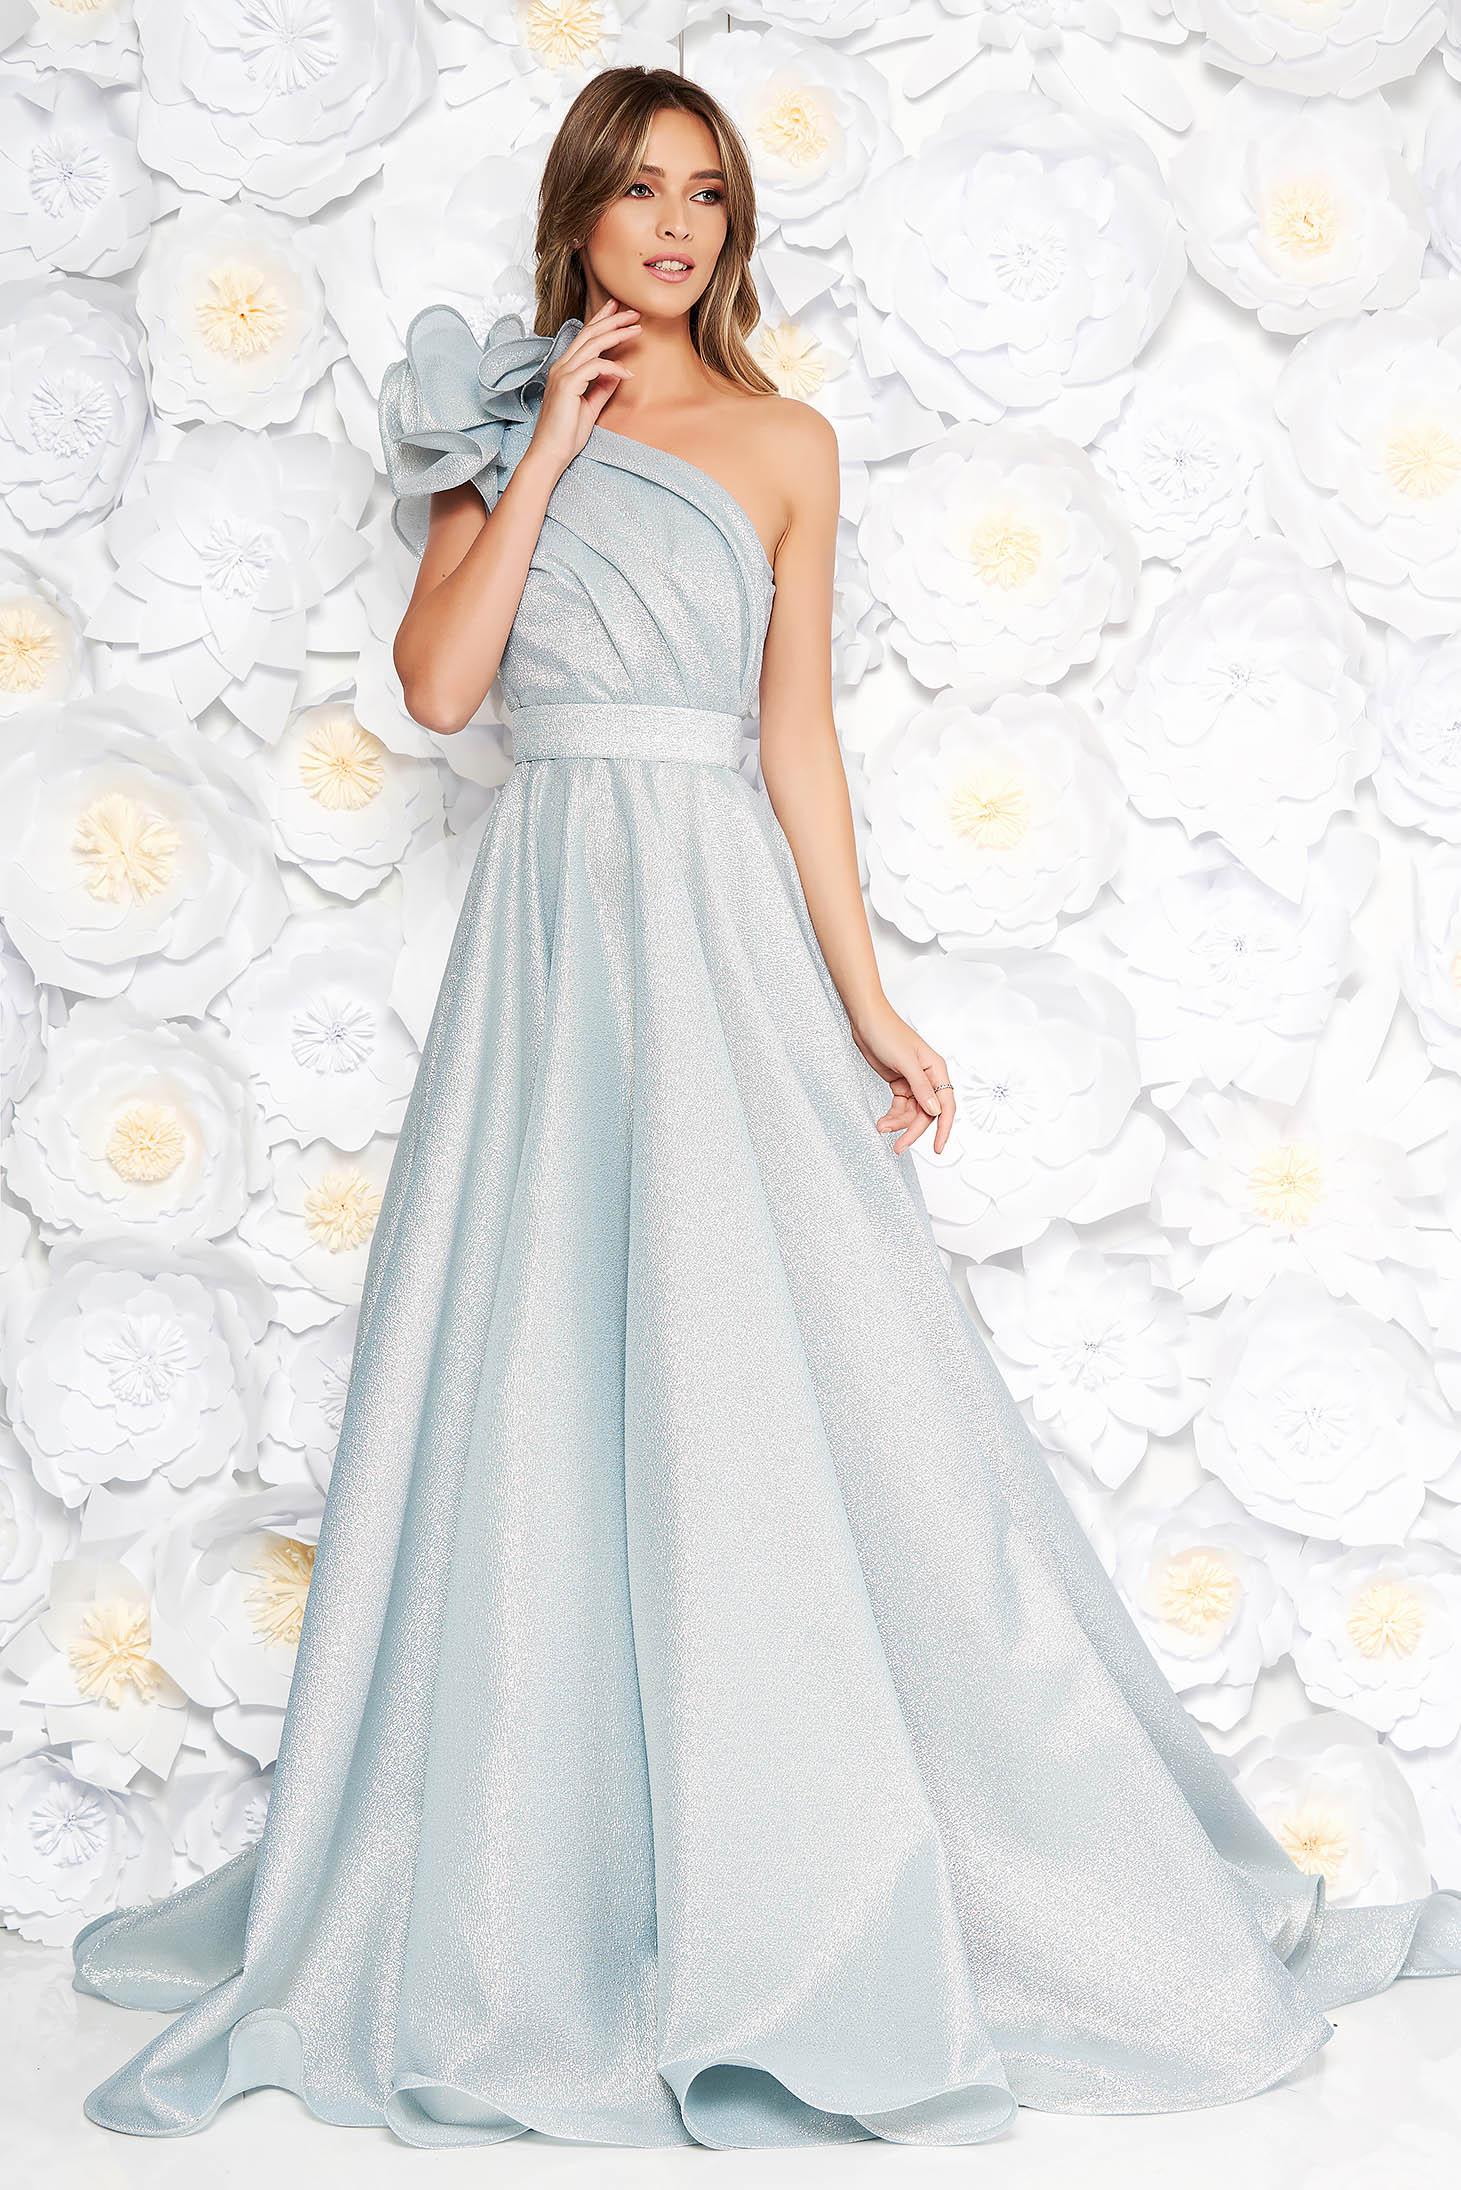 Ana Radu lightblue luxurious cloche dress nonelastic fabric with metallic aspect with inside lining with ruffle details